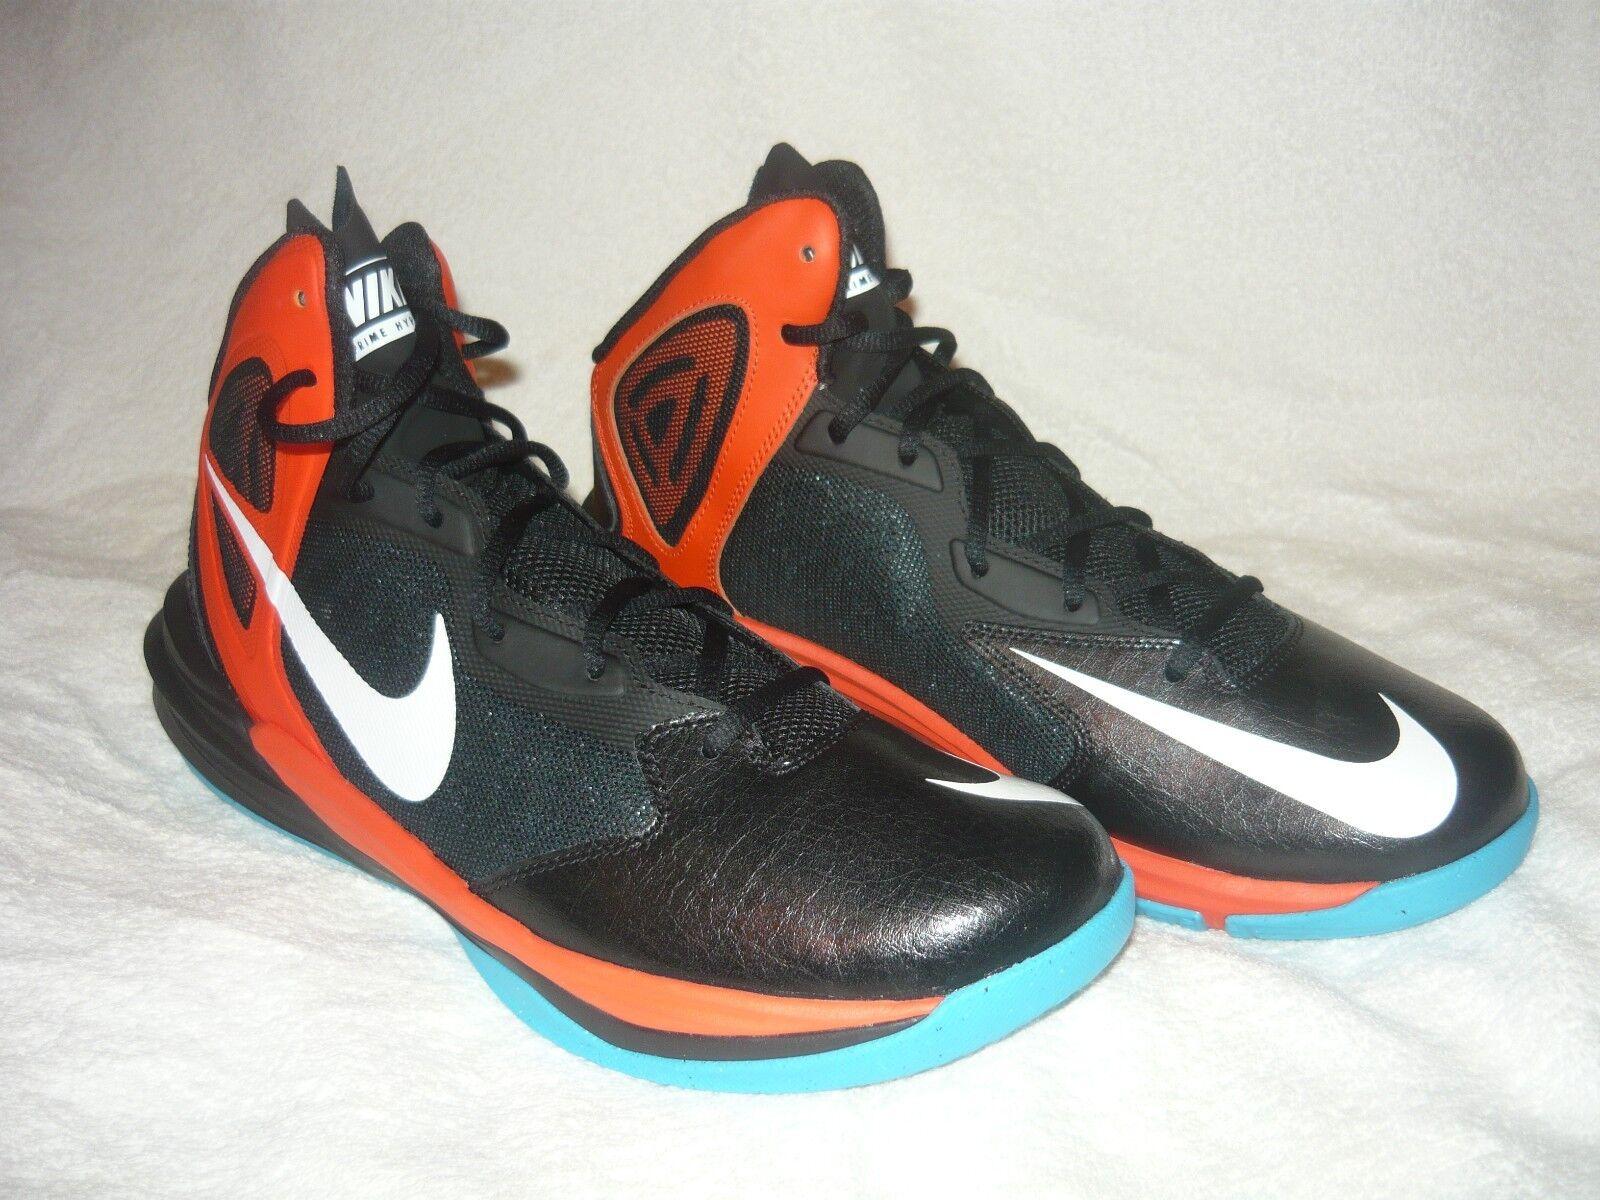 Nike Prime Hype DF 683705-004 size  11